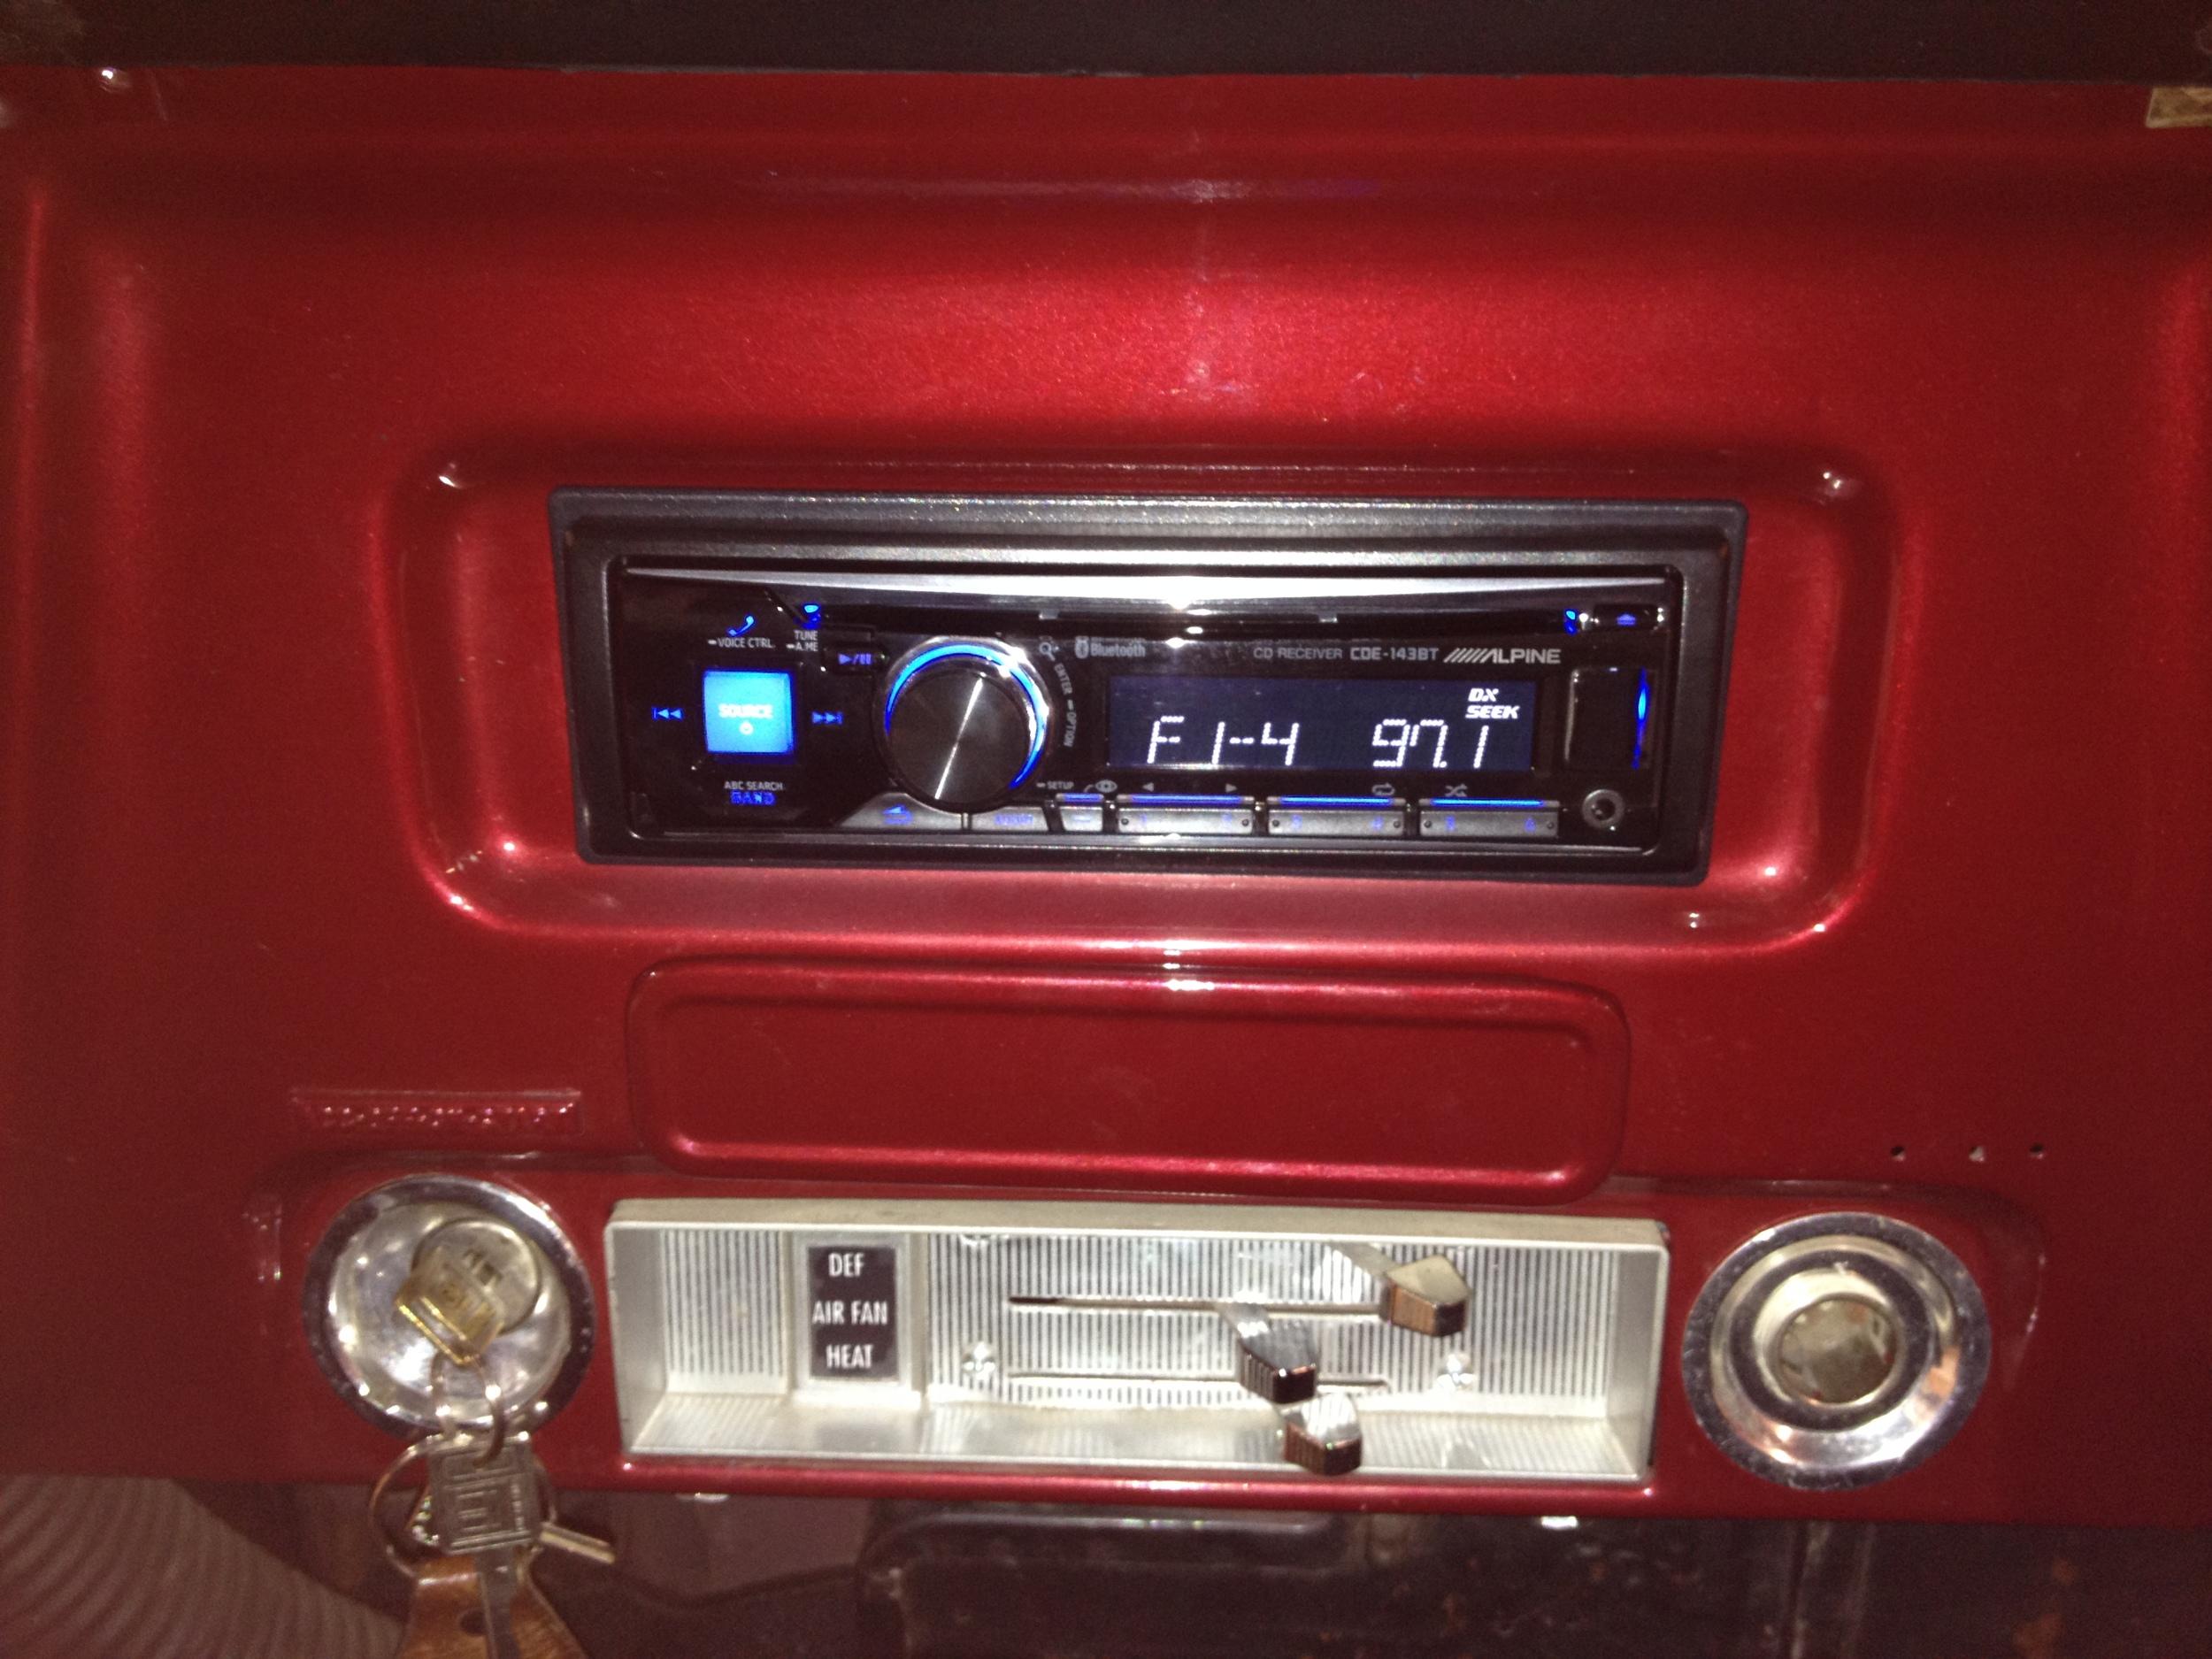 1969 Chevy C10 - Alpine CD Bluetooth Receiver